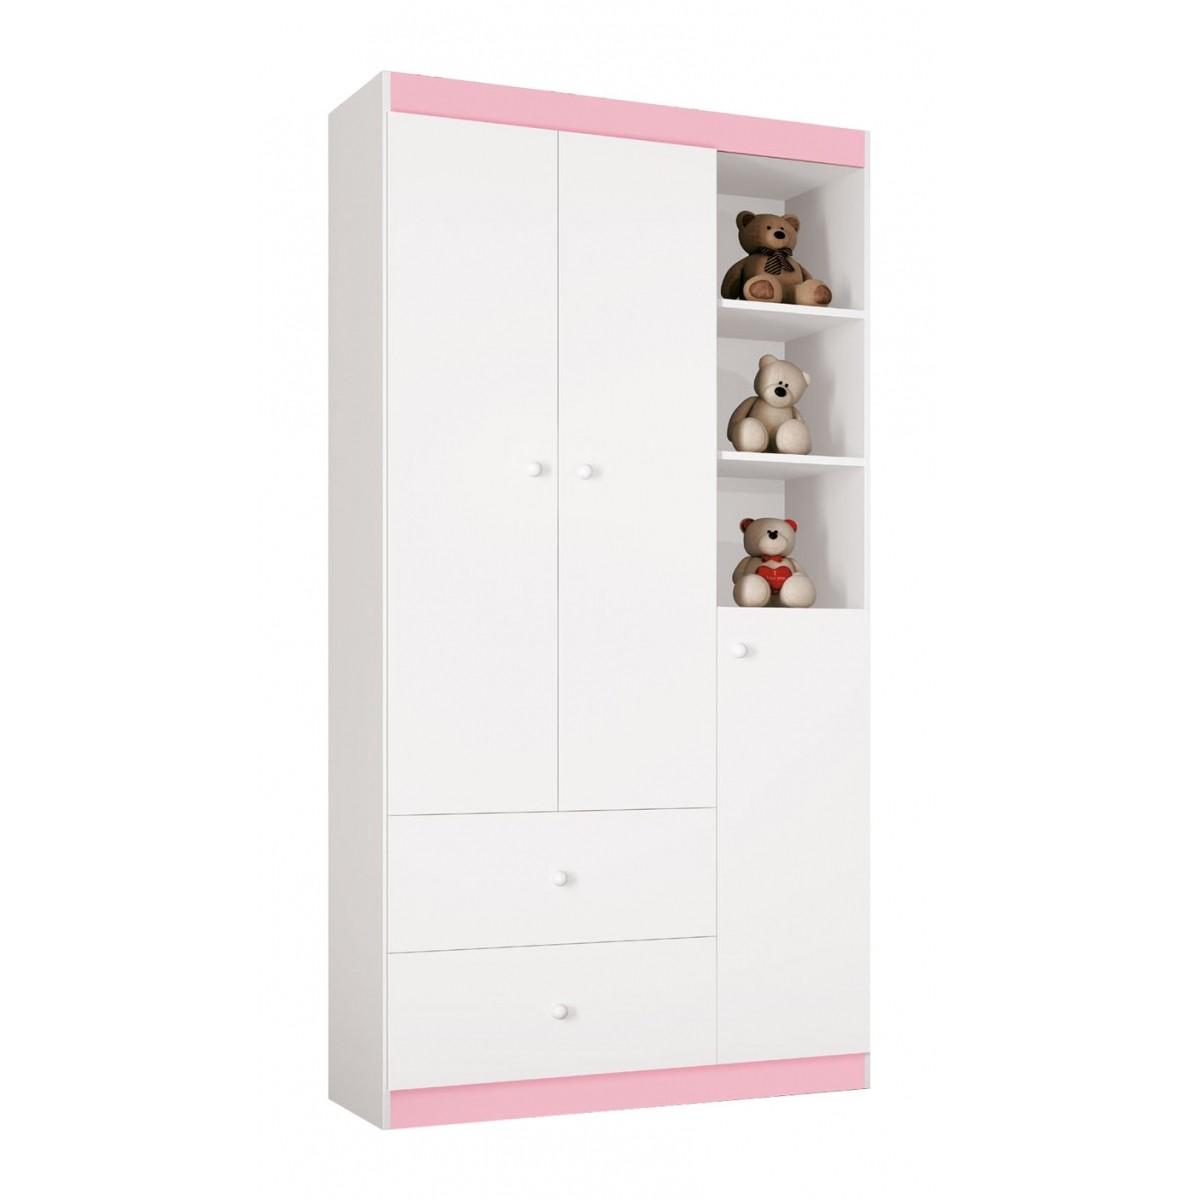 Guarda Roupa Encanto 3 Portas Branco com Rosa - Imaza Moveis